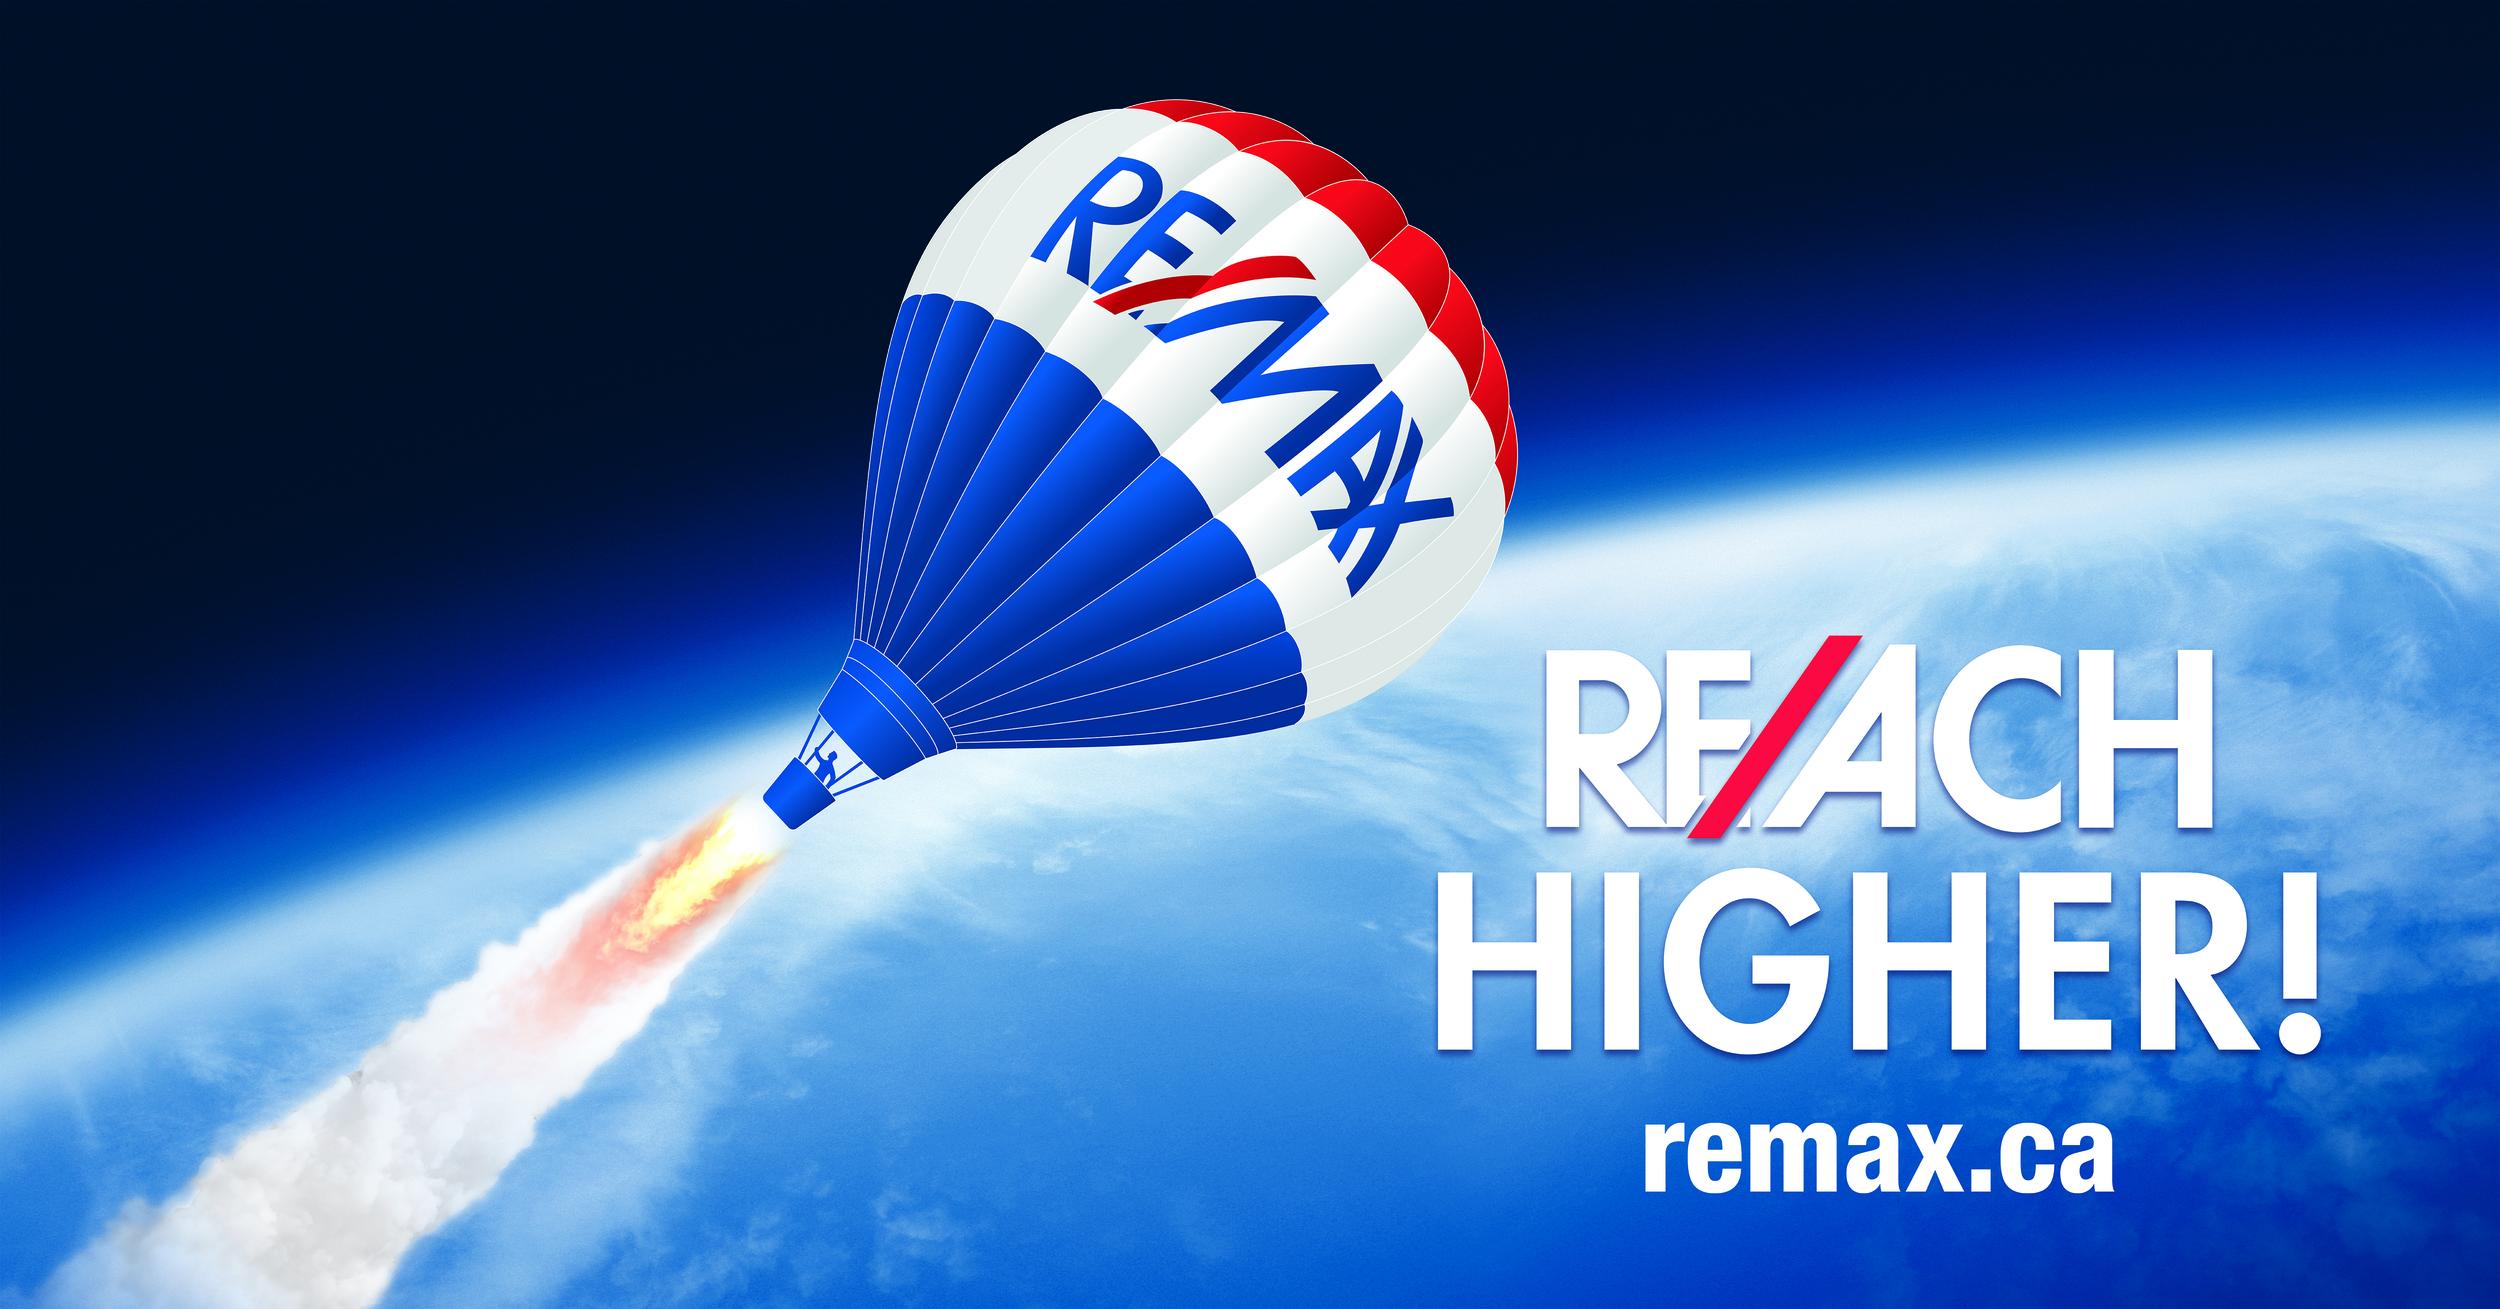 Remax-Reach Higher2.jpg